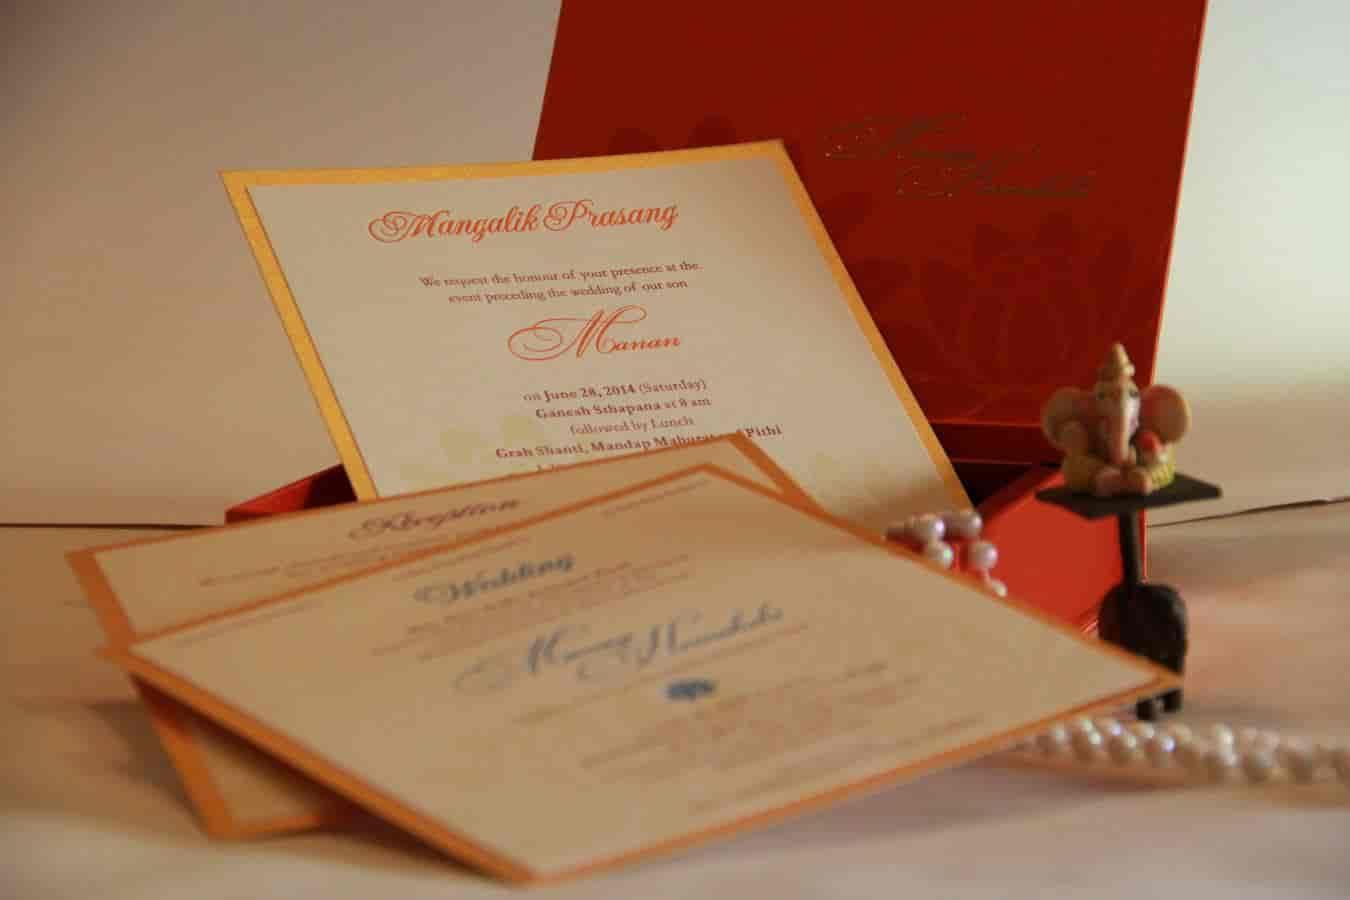 Invitations design studio photos satellite ahmedabad pictures wedding cards in display invitations design studio photos satellite ahmedabad wedding card stopboris Images